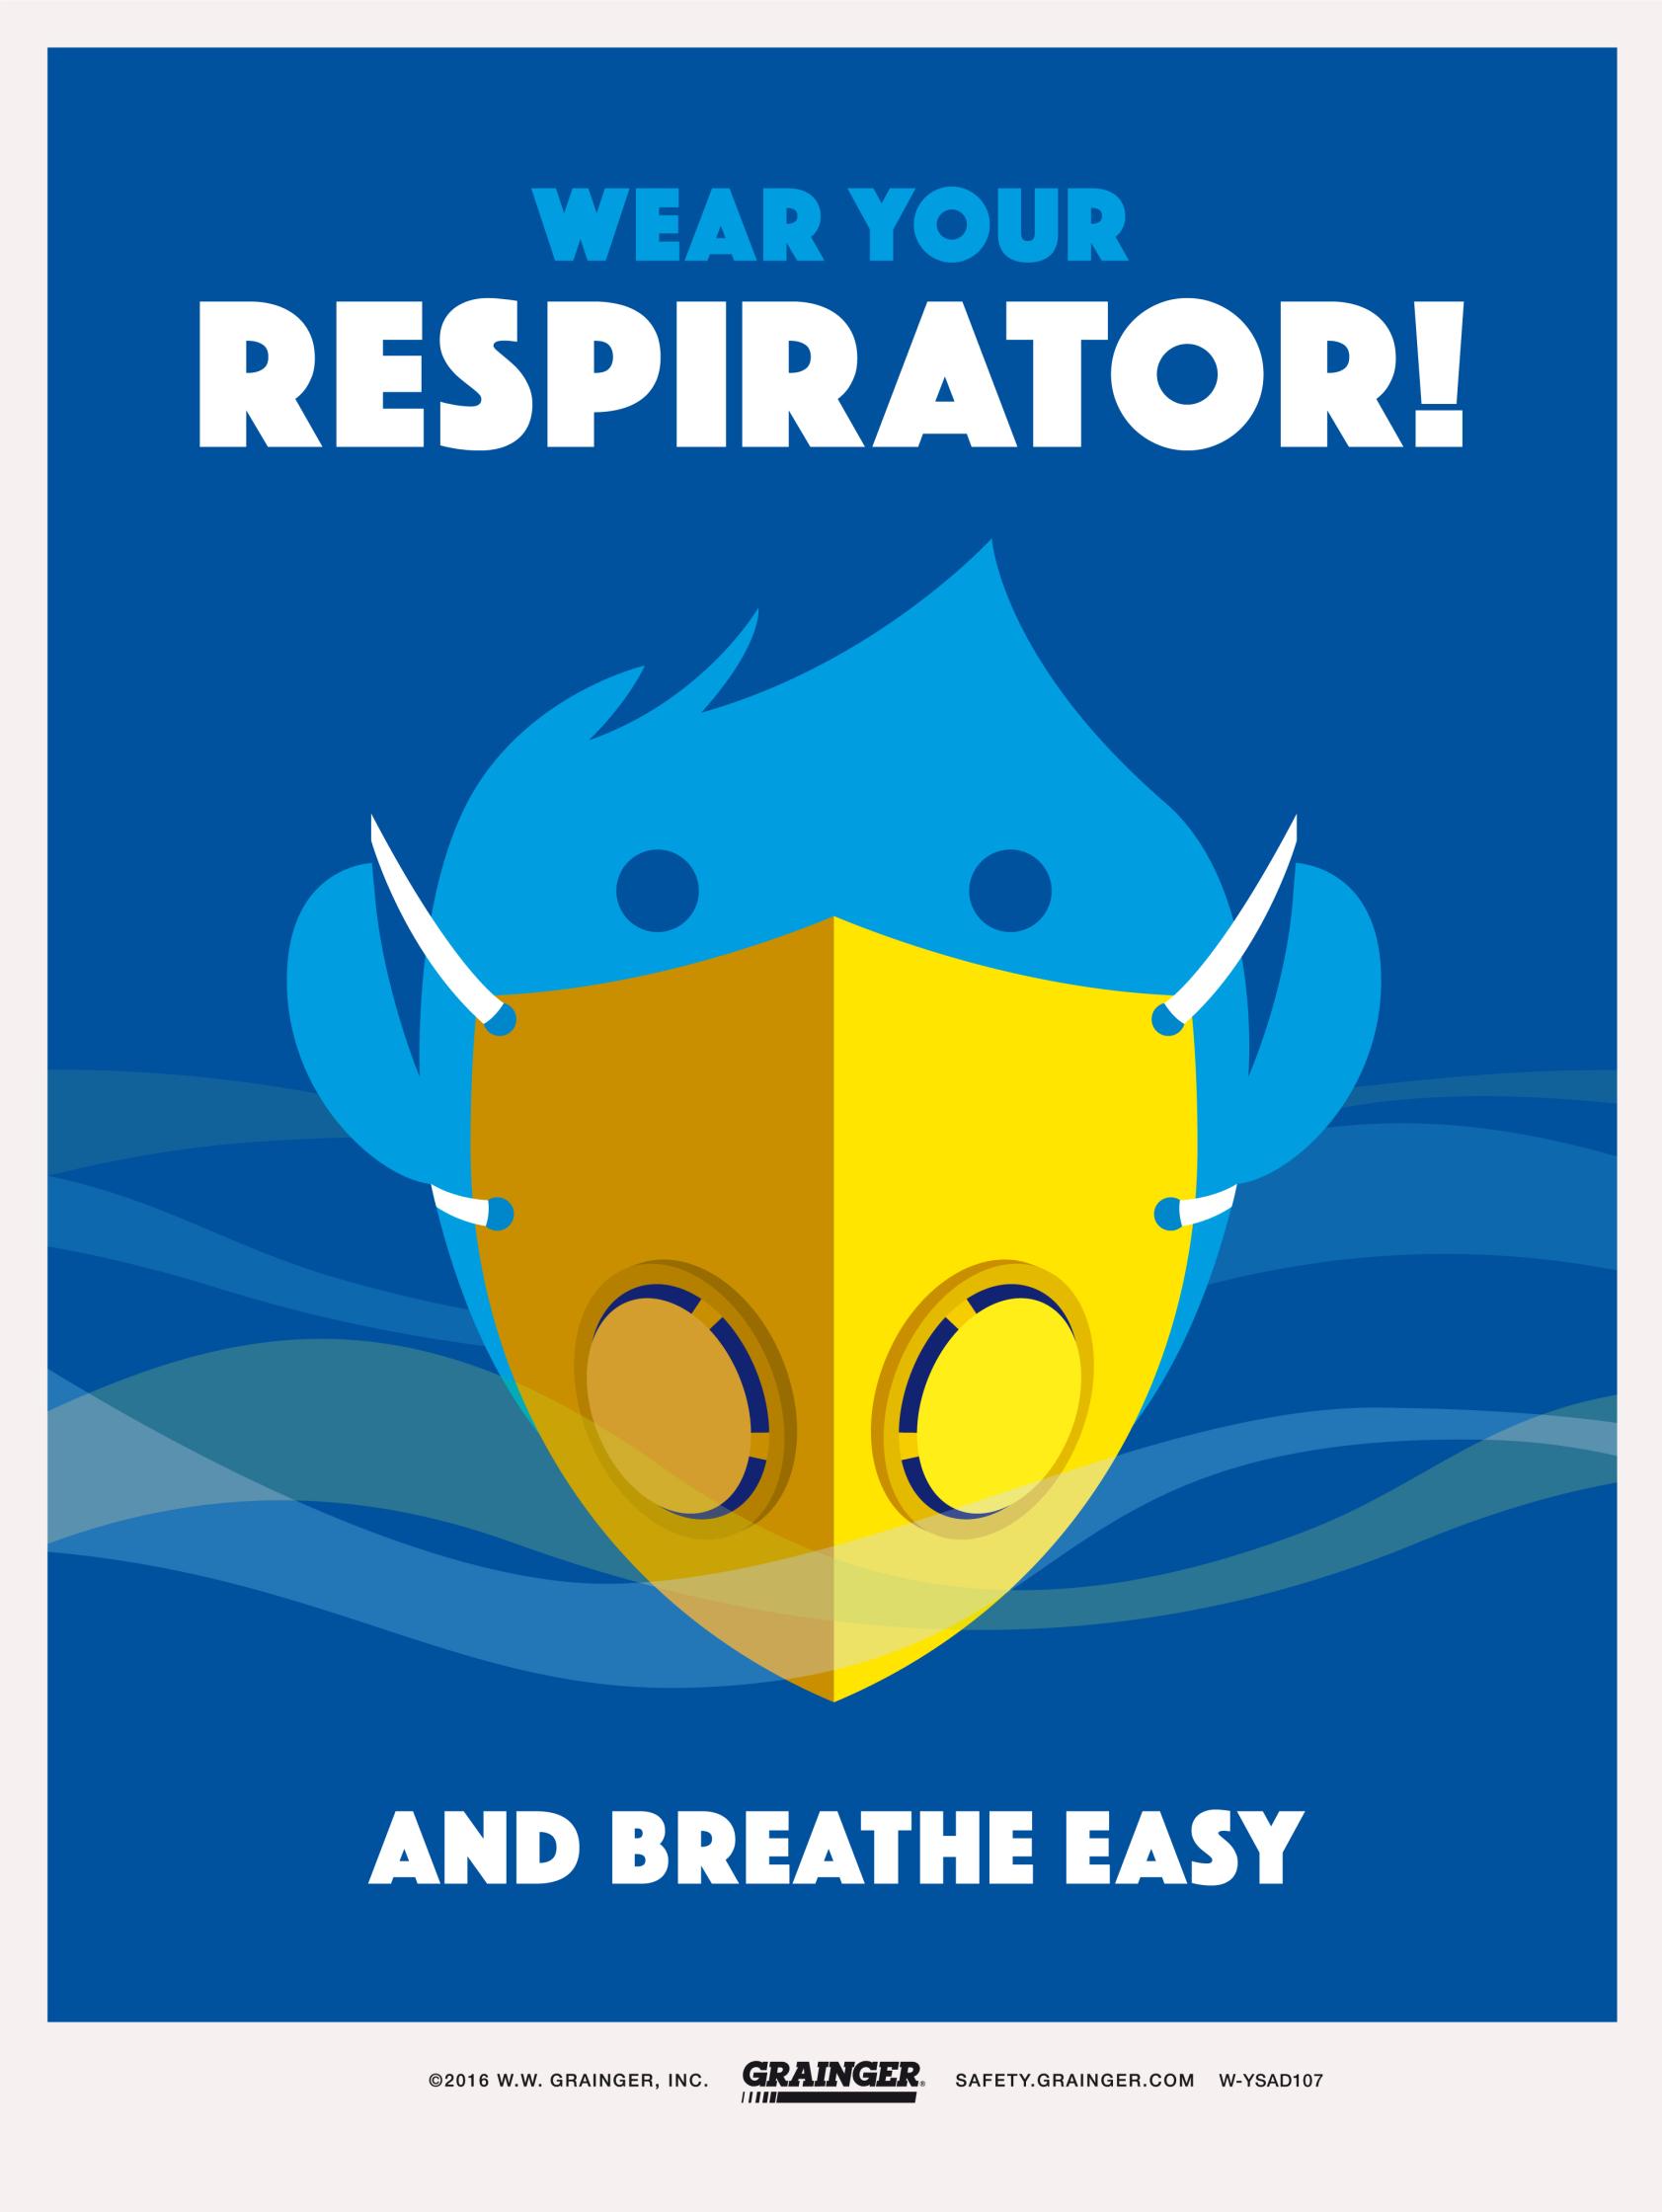 wear-your-respirator.jpg